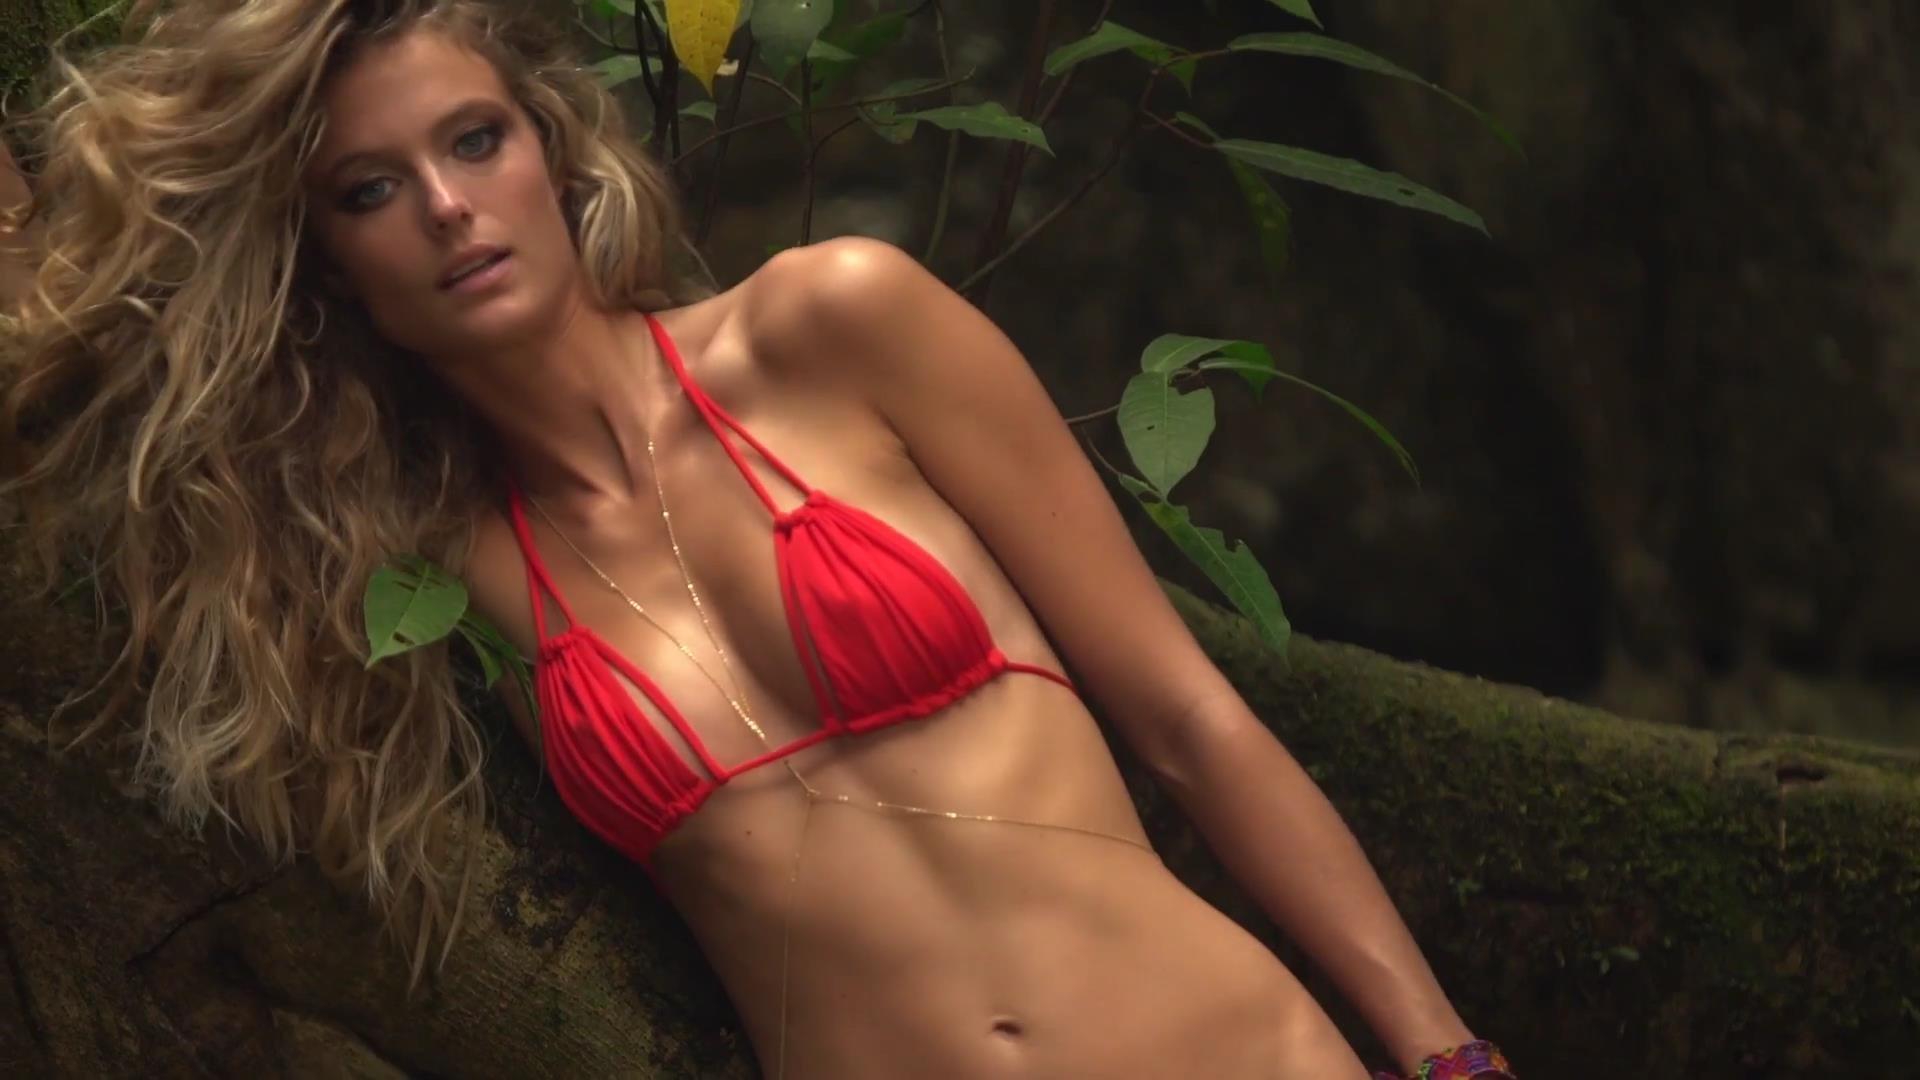 Kate bock nude bending over boat